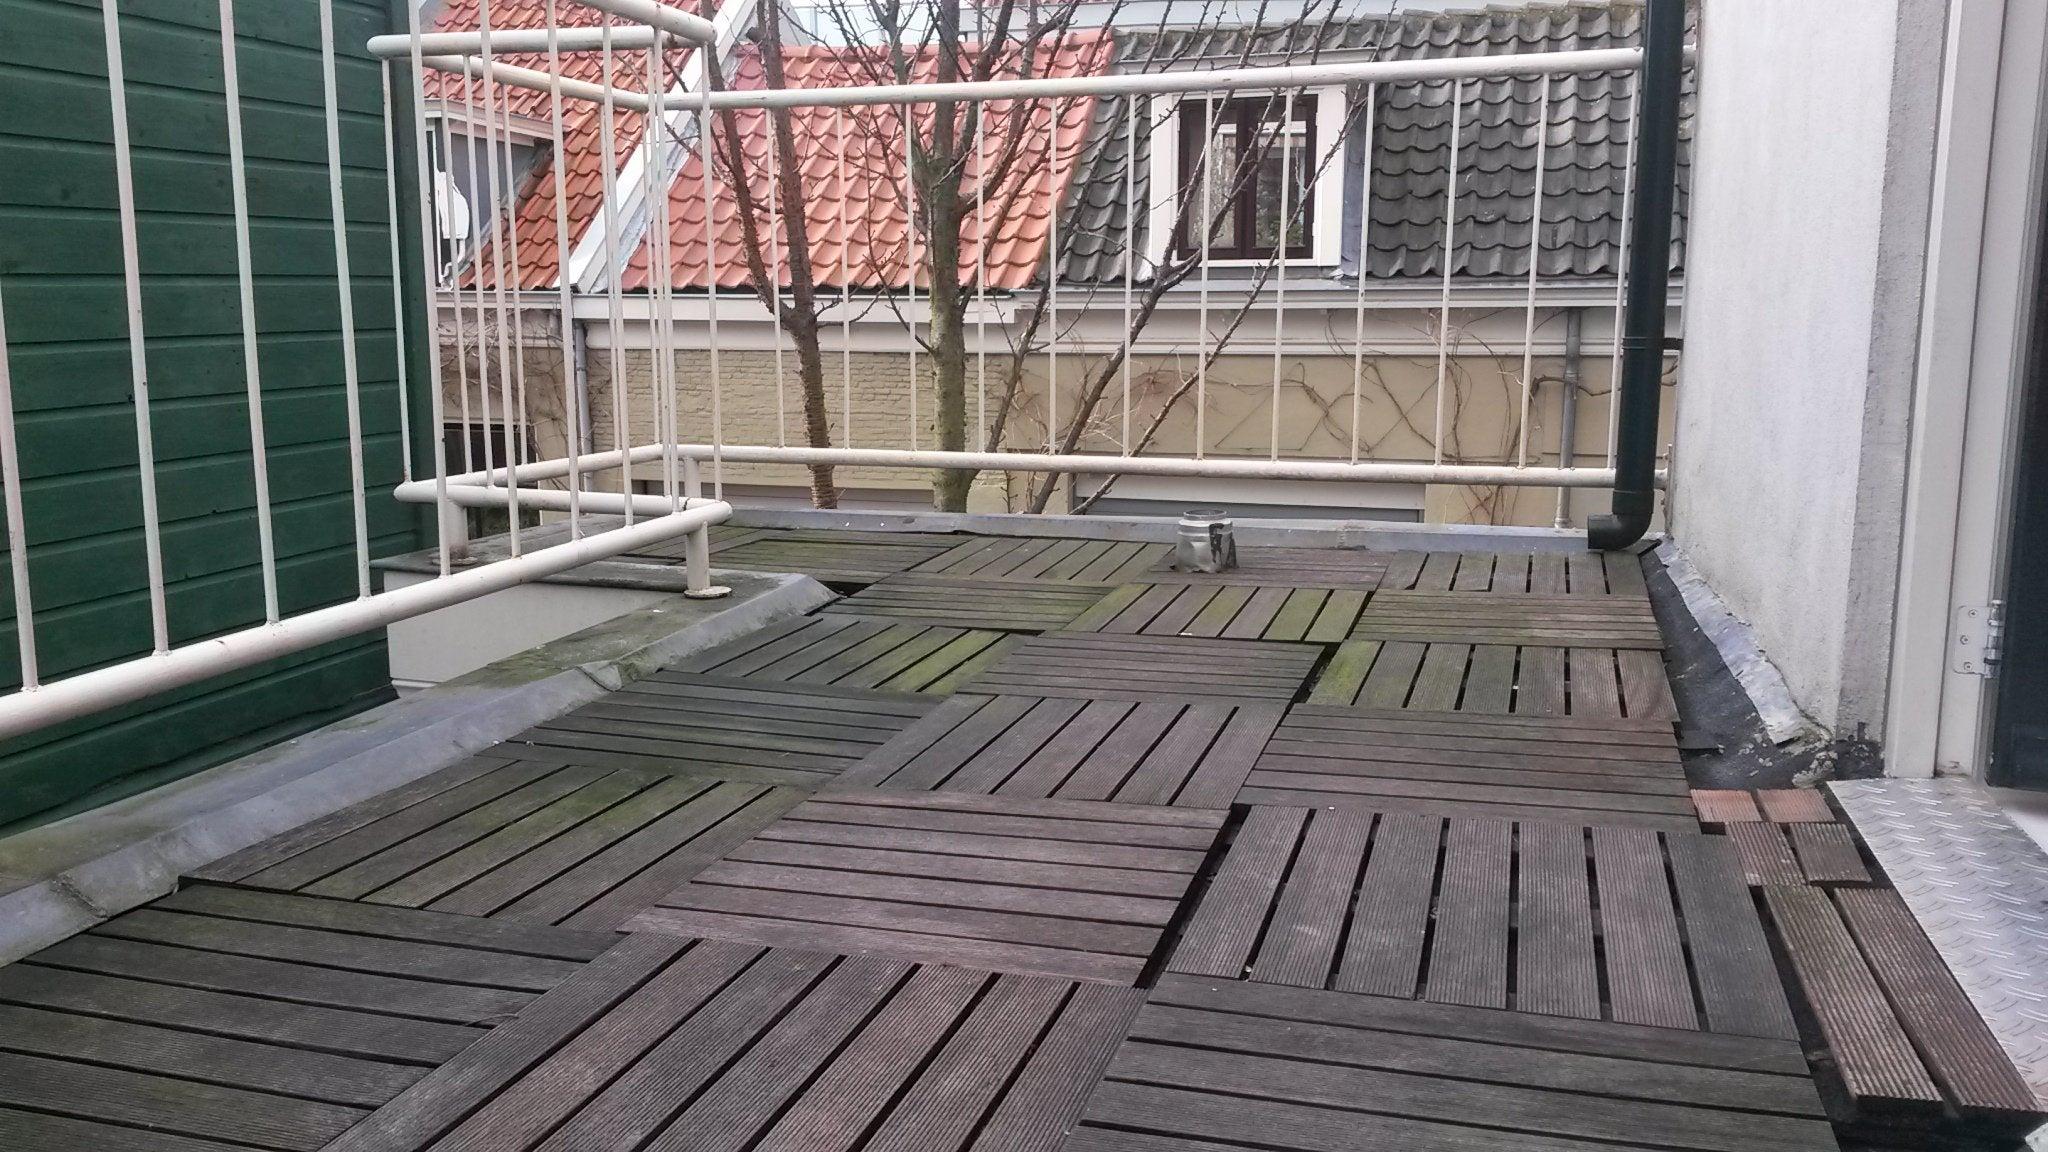 https://public.parariusoffice.nl/216/photos/huge/2306391.1423050106-412.jpg